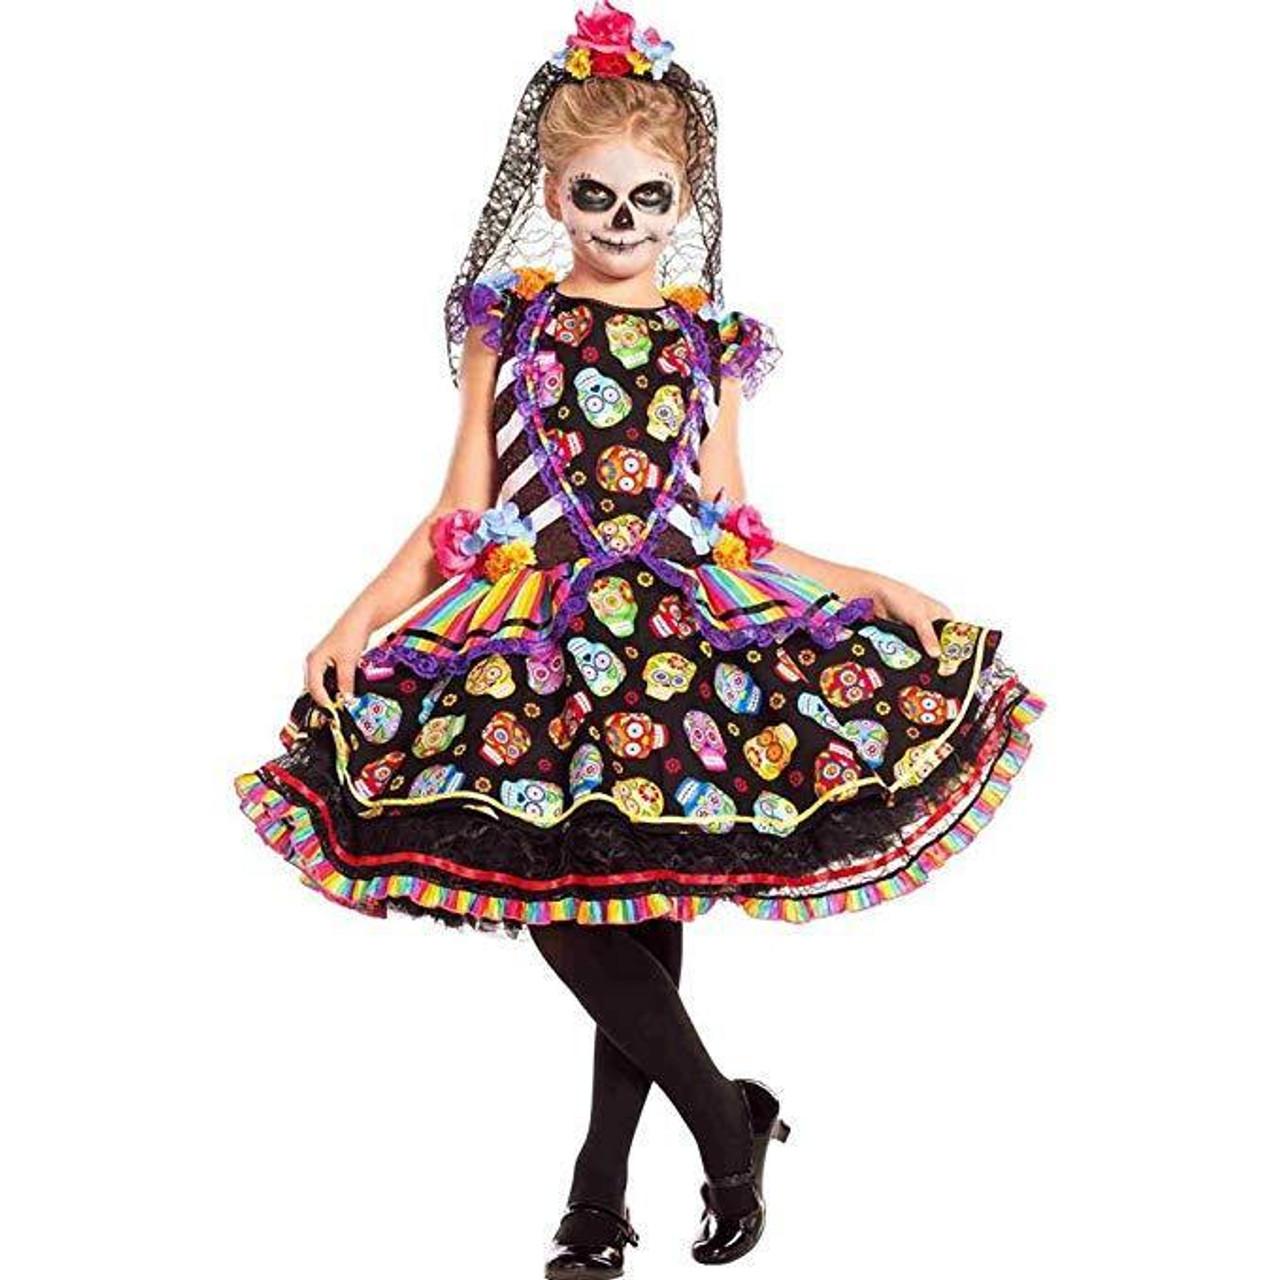 2d2021853dd Party King Sugar Skull Senorita Day of the Dead Childs Halloween Costume  PK769C